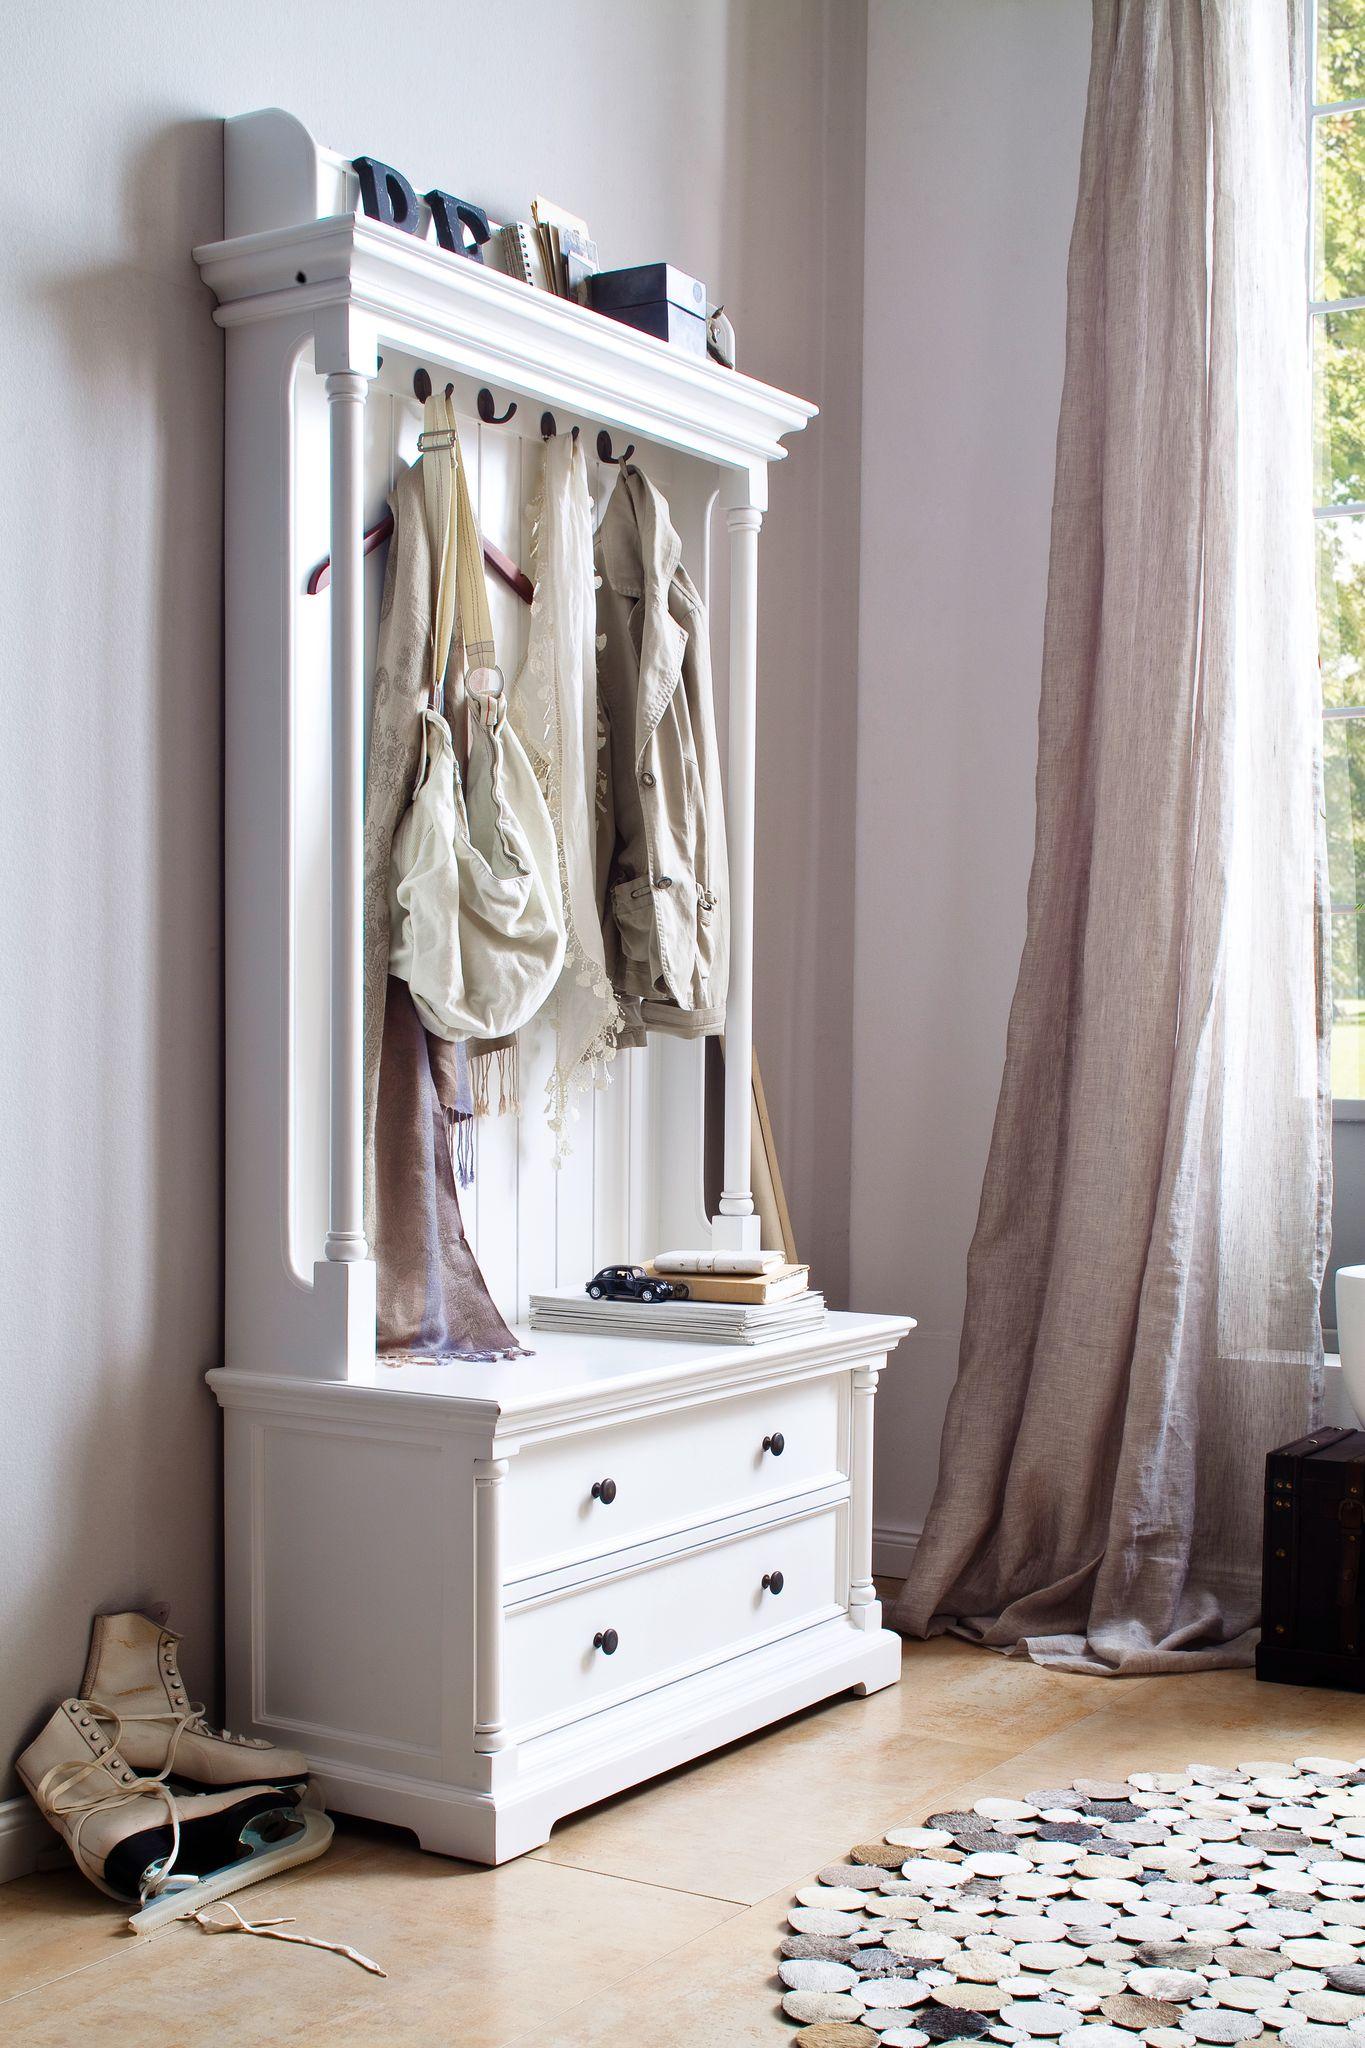 Coat hanger unit w/2 drawers